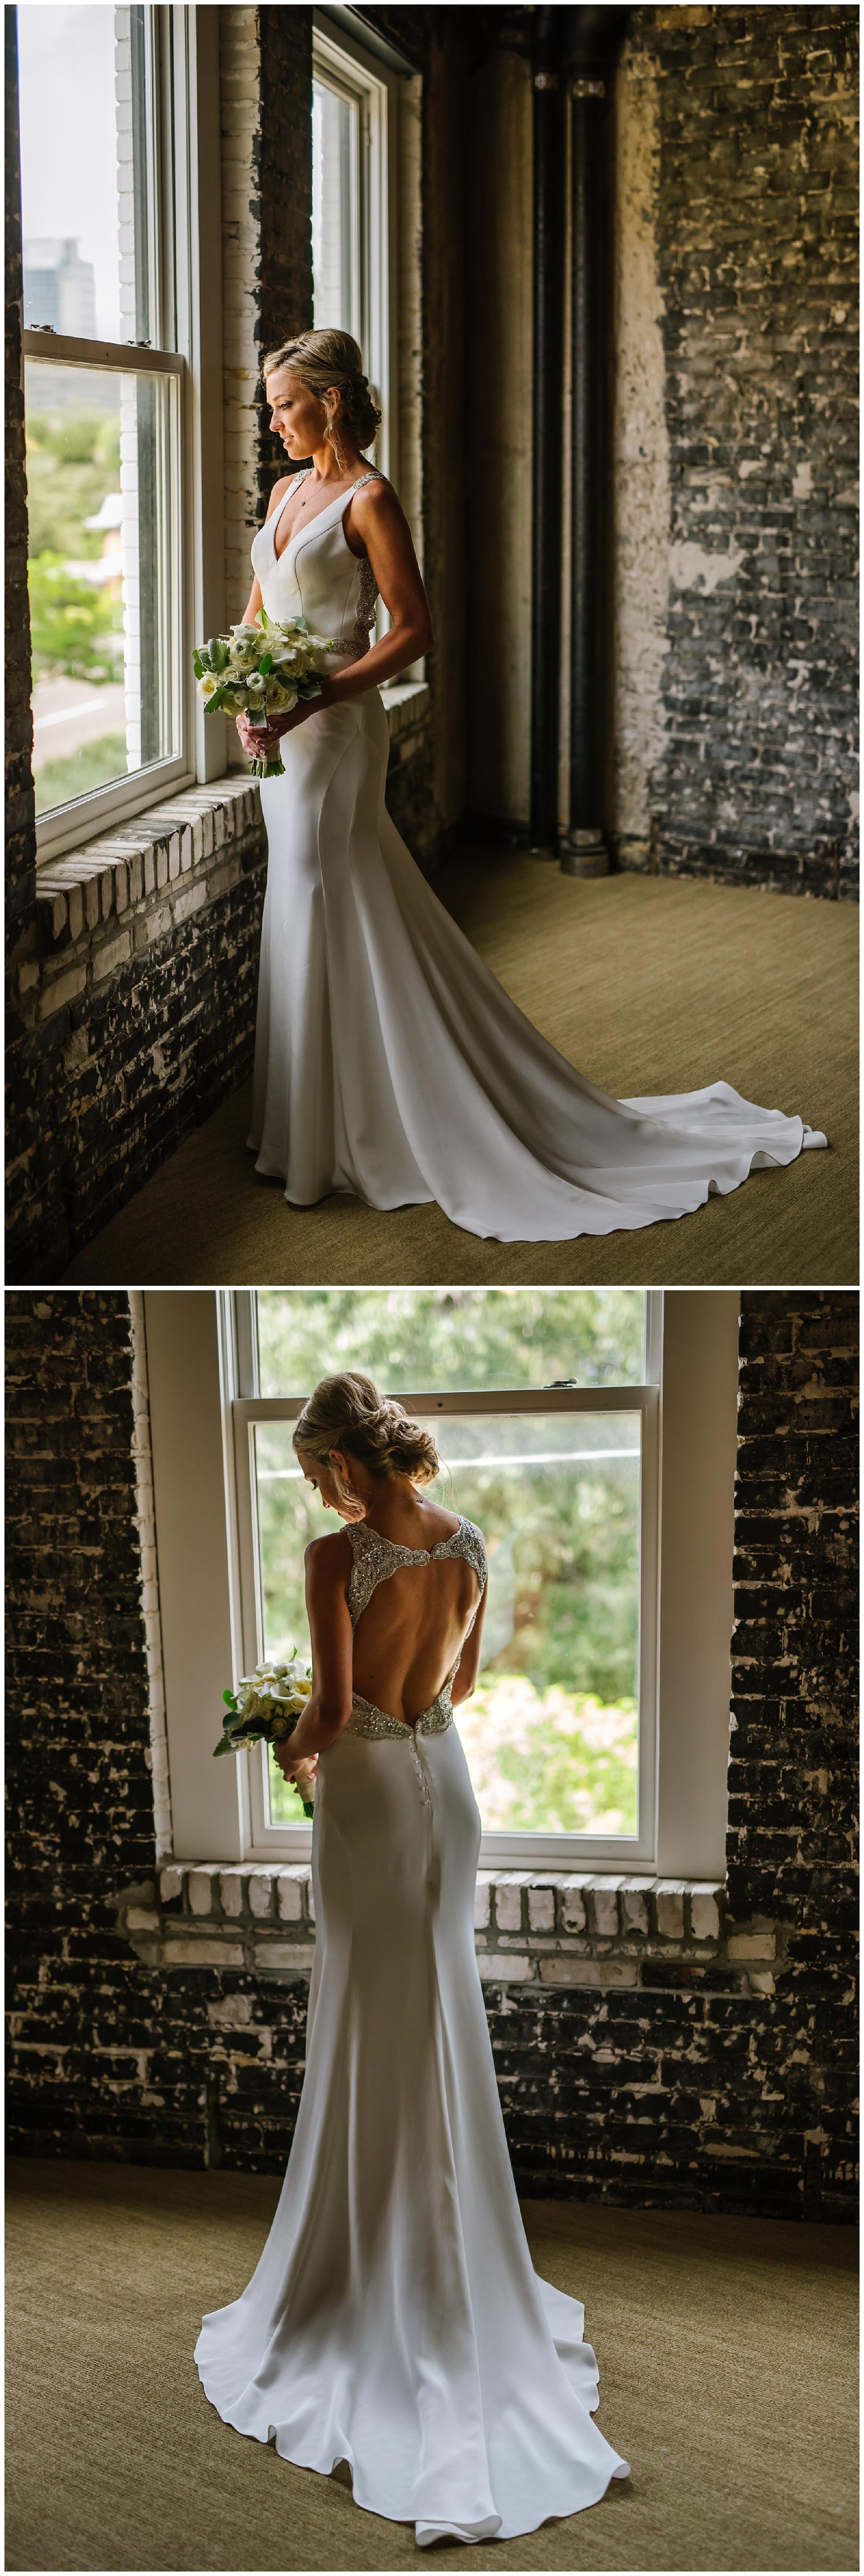 Oxford-exchange-wedding-photogapher-garland-candels-bookstore-burgandy-botanica_0018.jpg